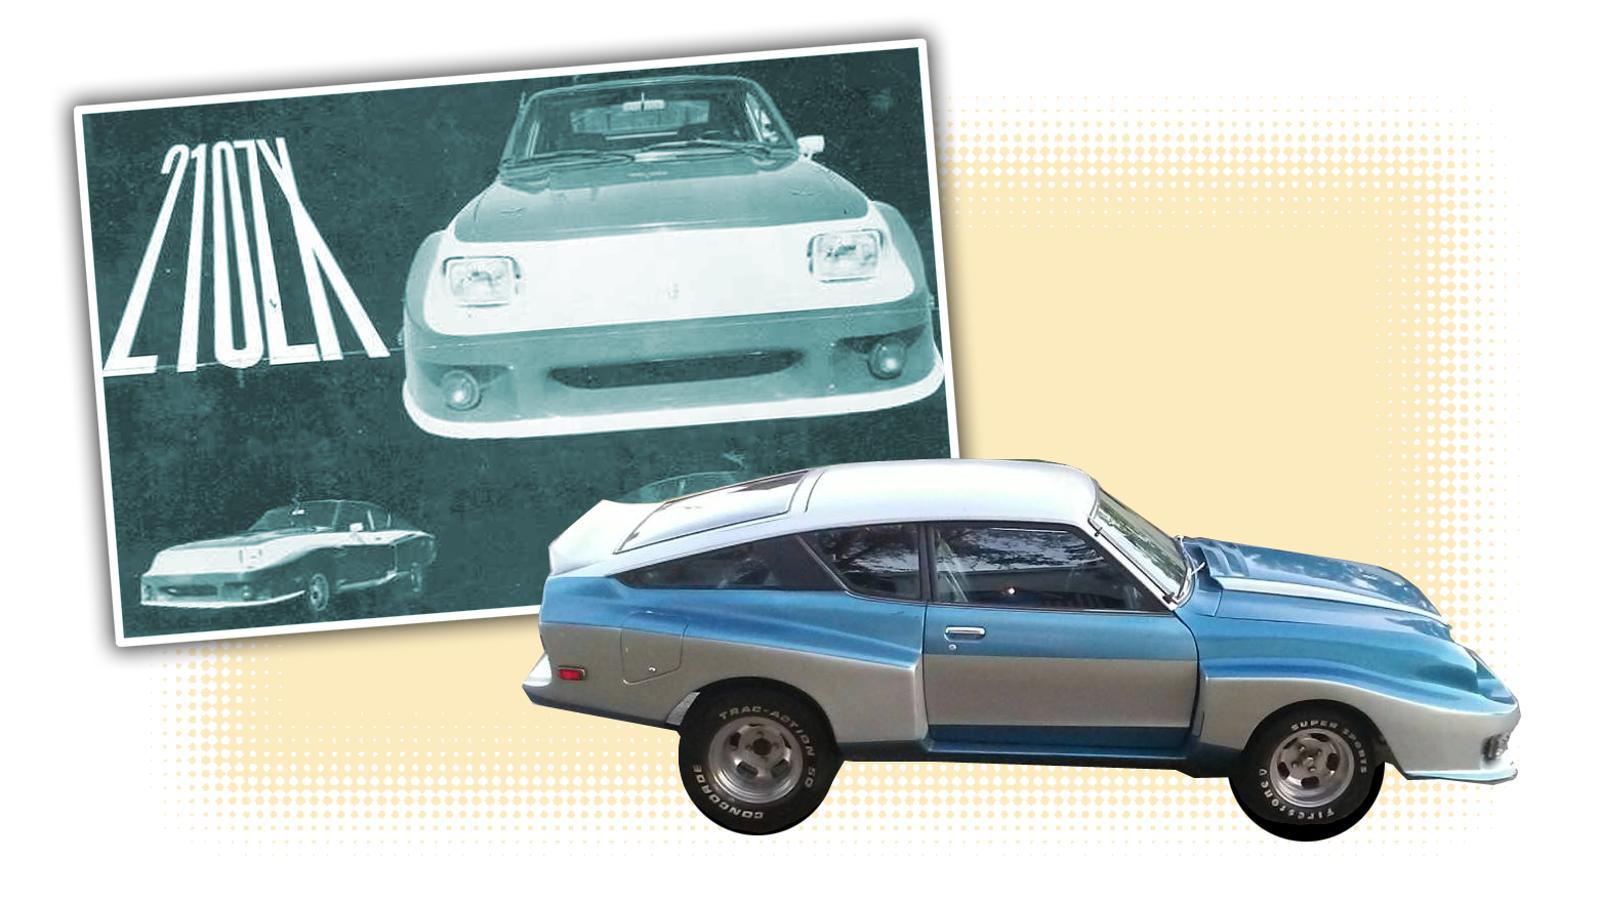 Kit Cars News, Videos, Reviews and Gossip - Jalopnik